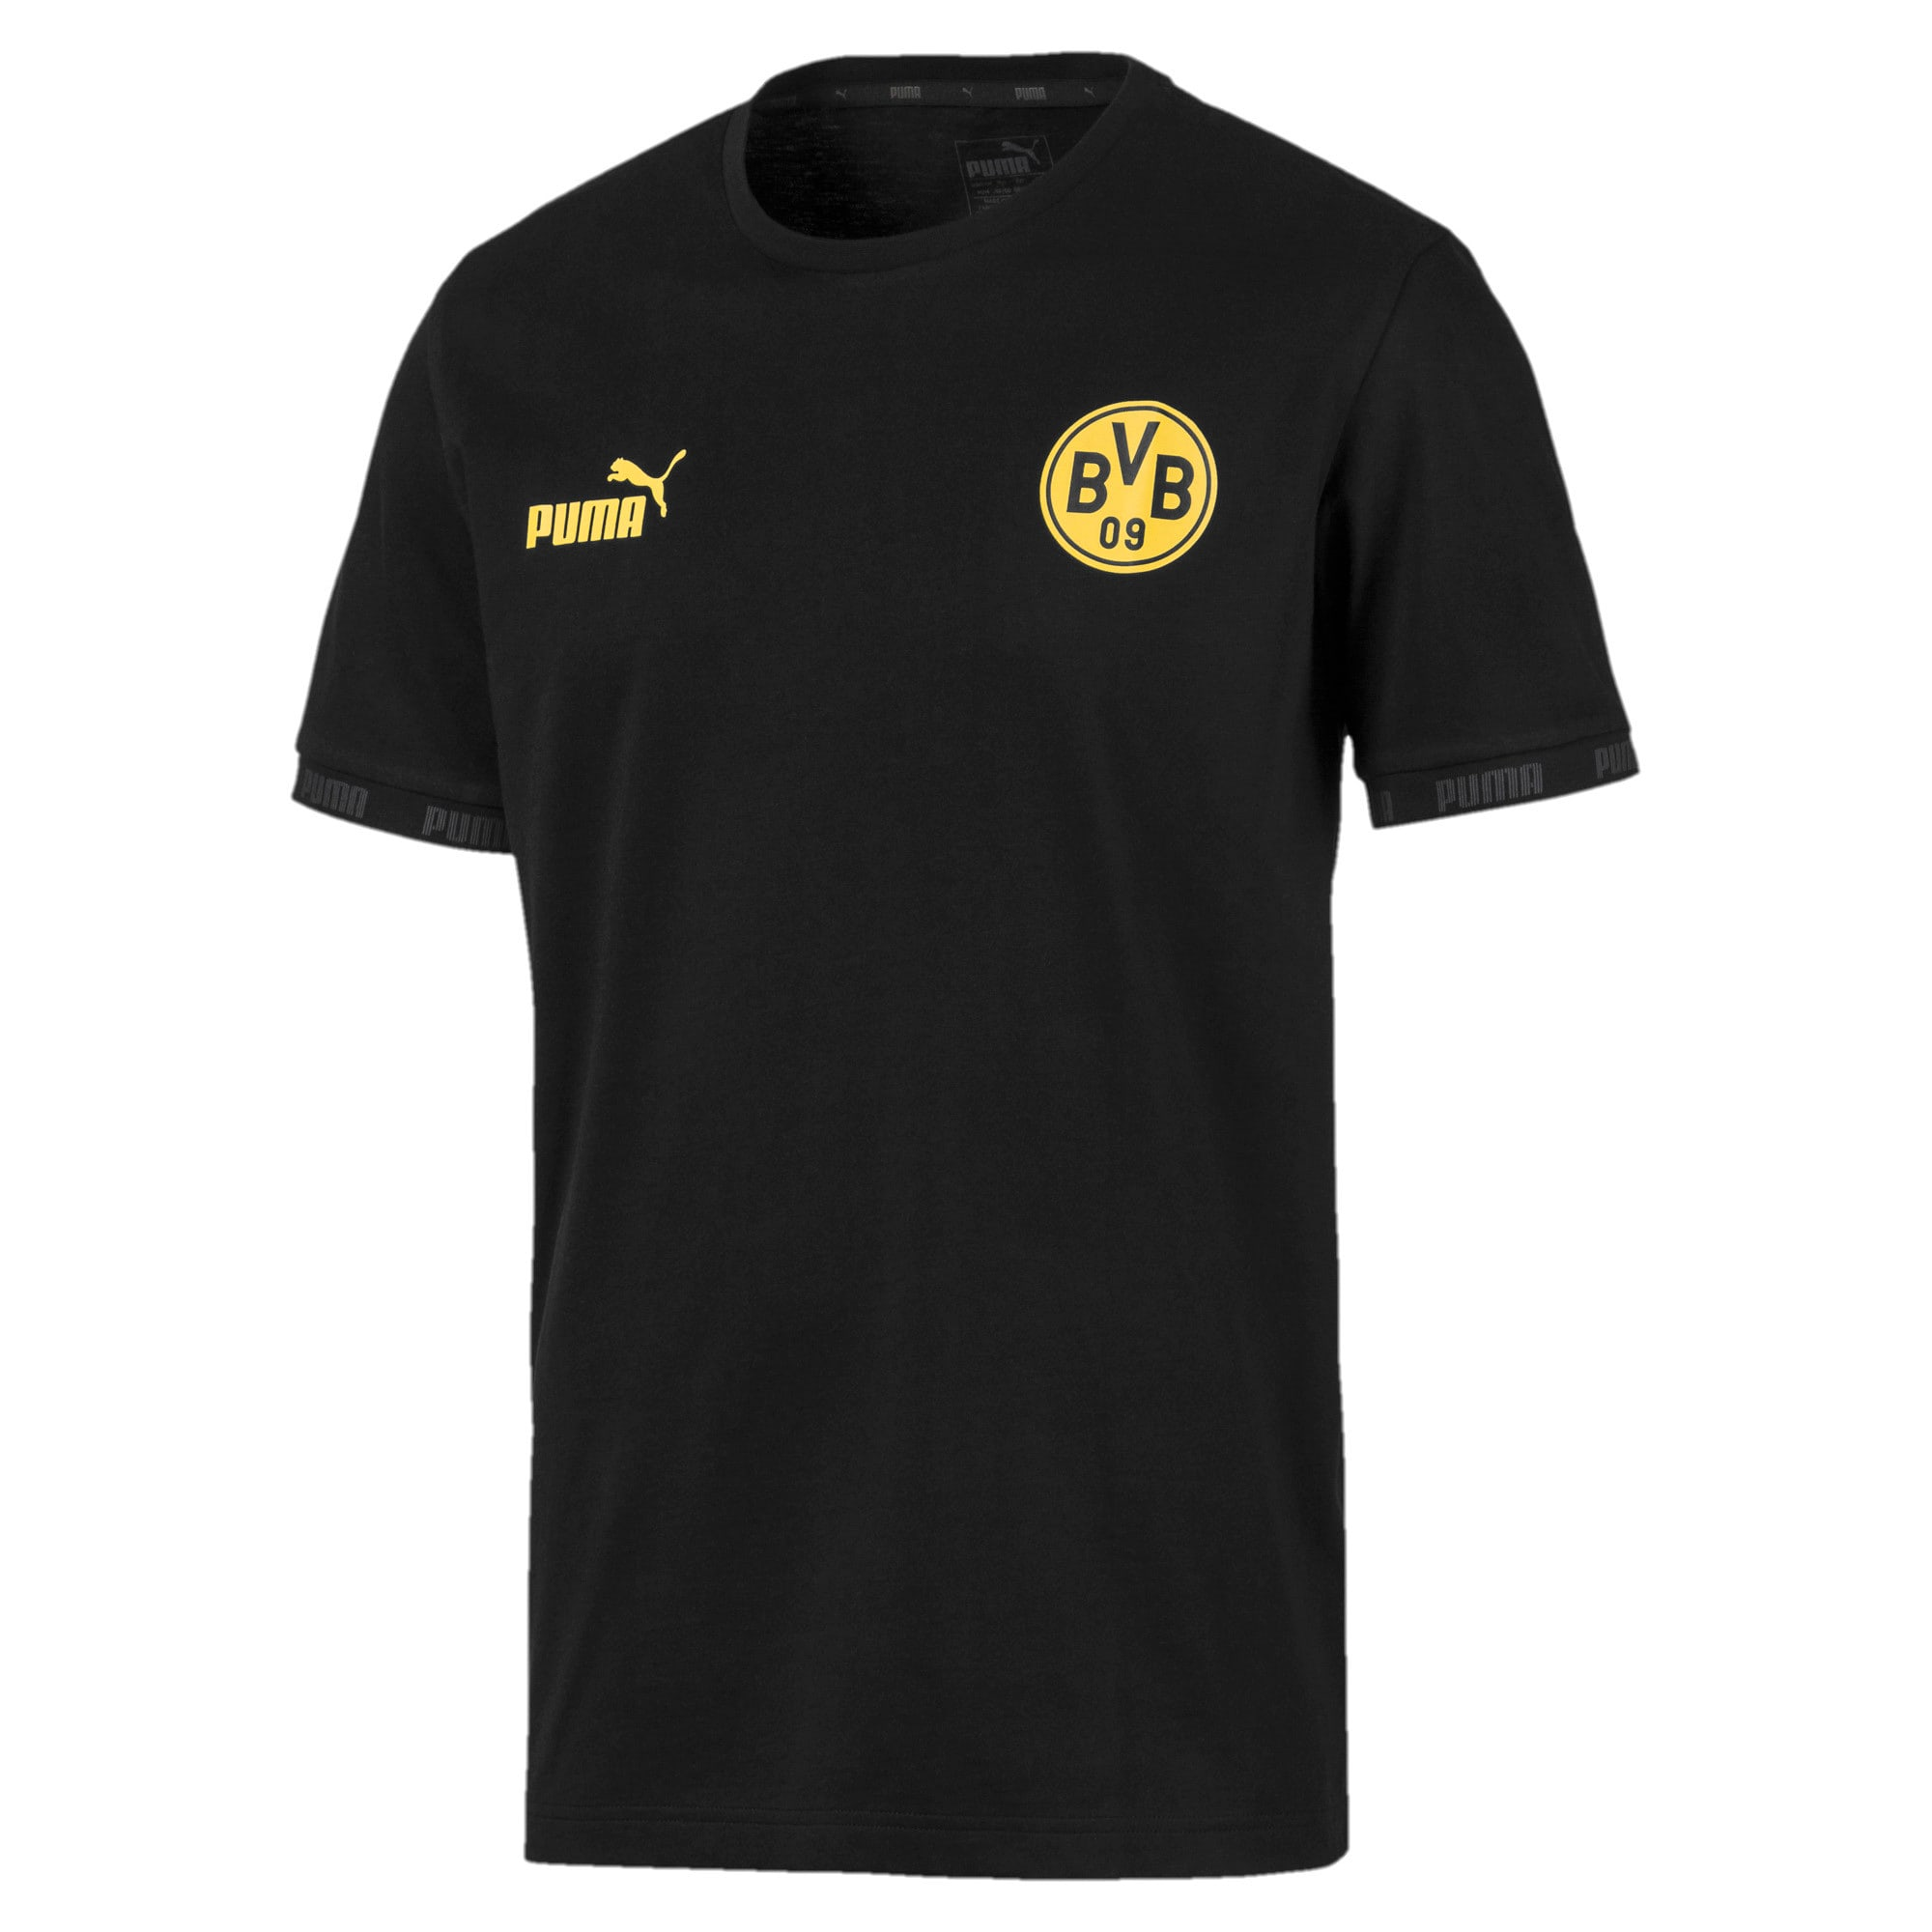 Thumbnail 4 of BVB Football Culture Men's Tee, Puma Black, medium